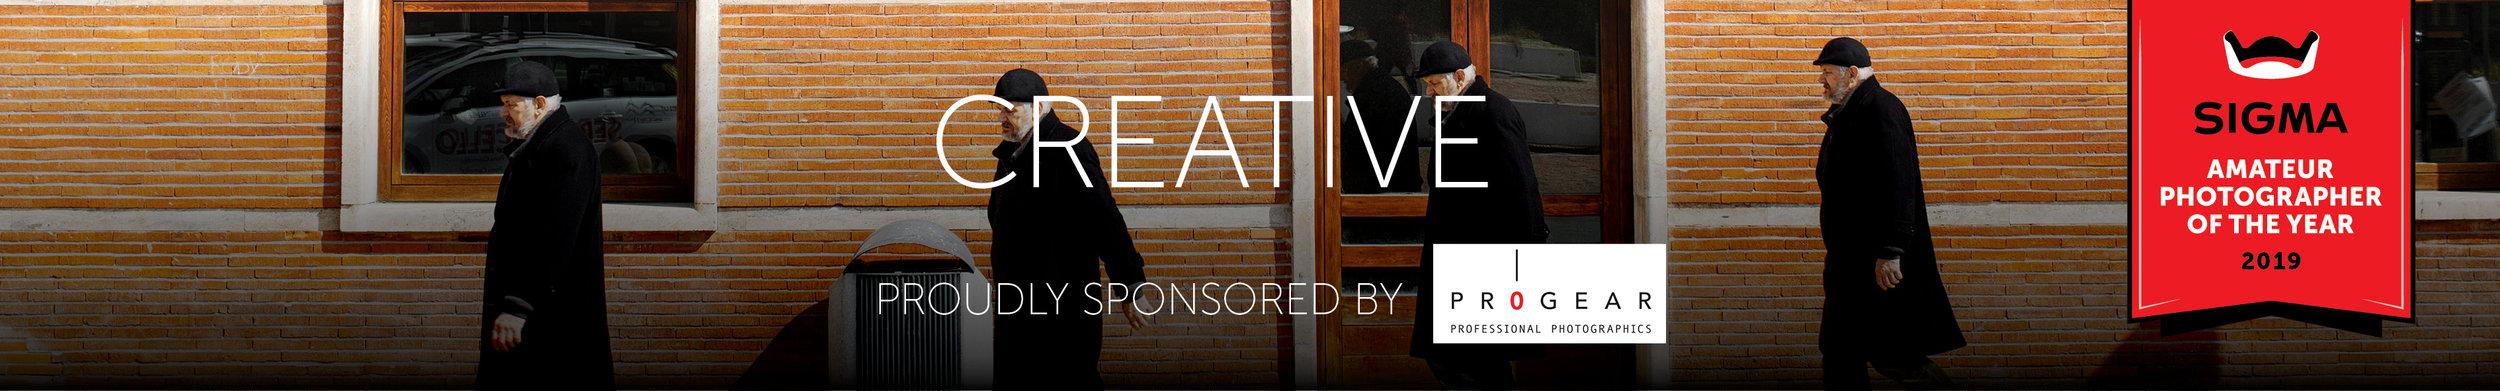 Creative 320x50px.jpg